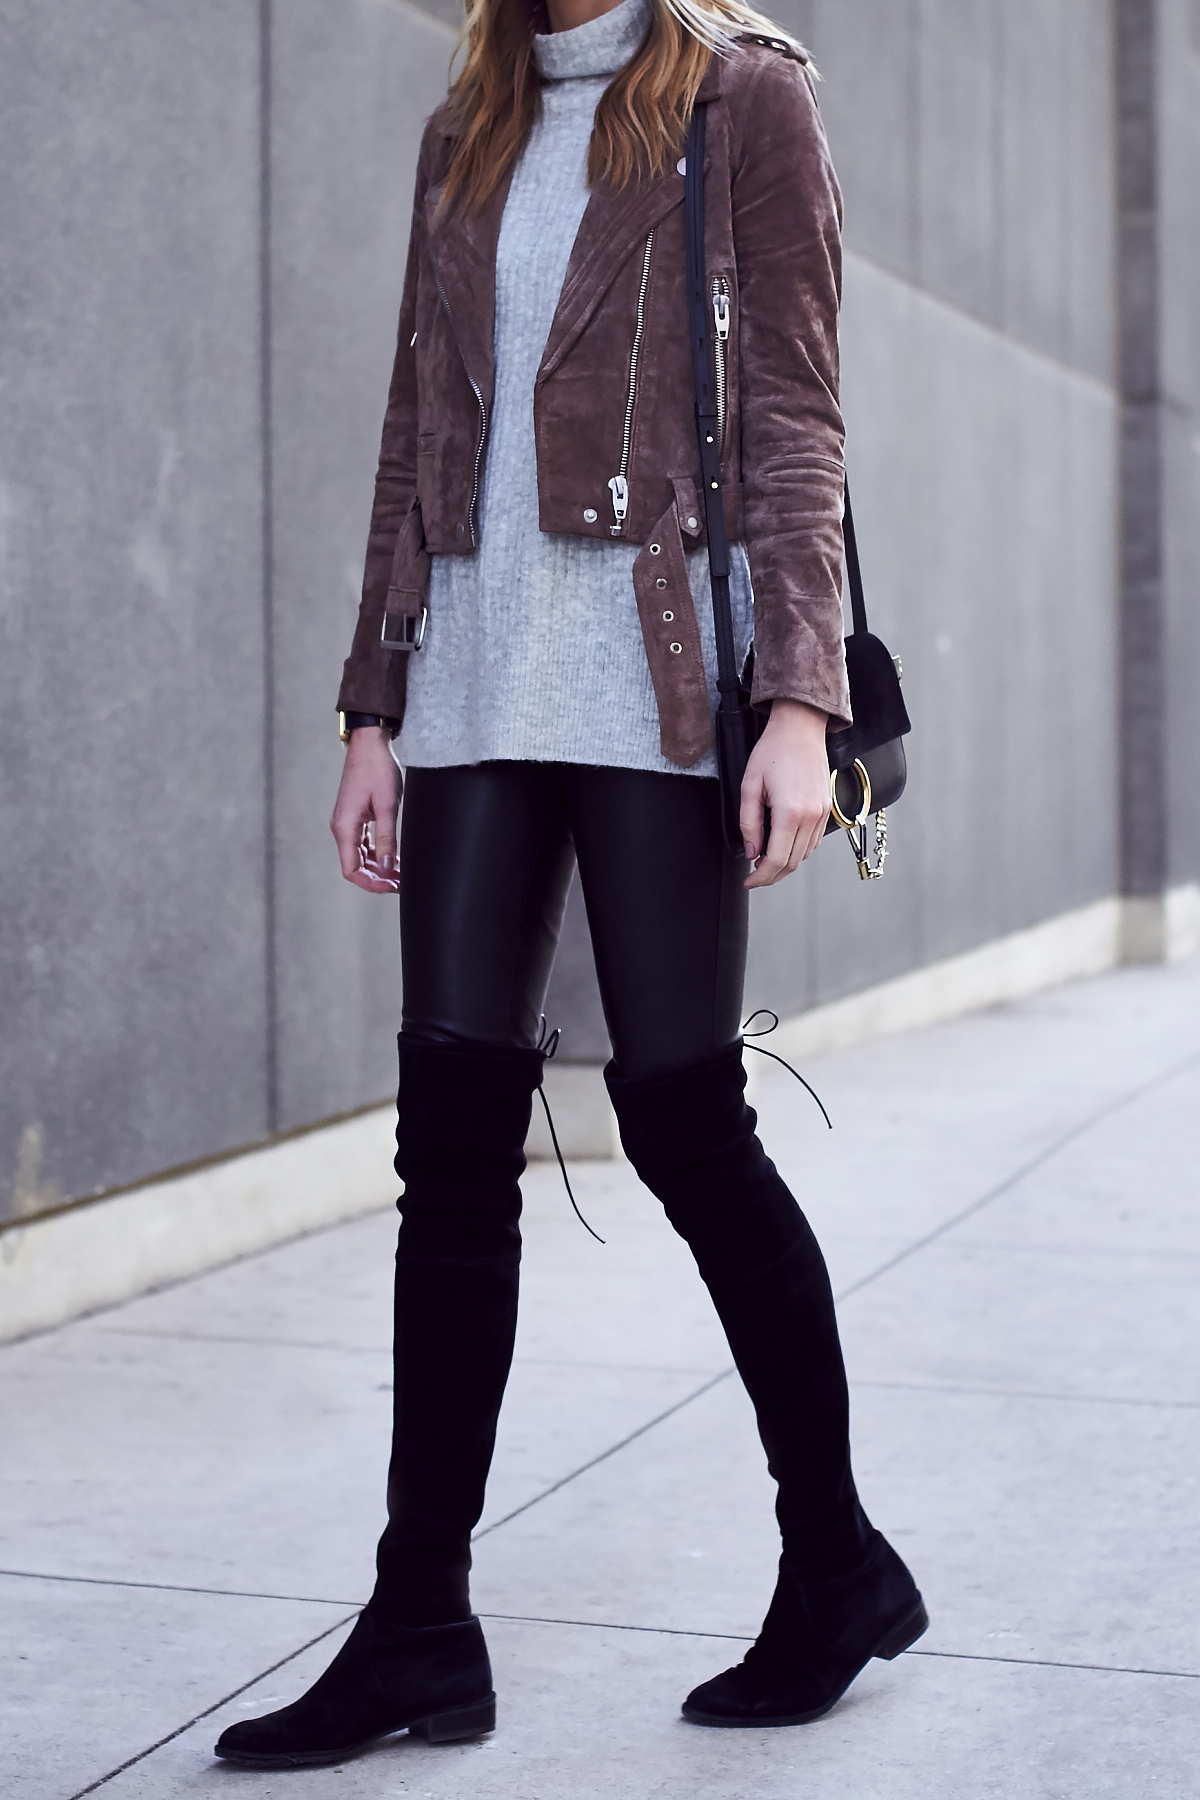 Closet Staple A Suede Moto Jacket Fashion Jackson